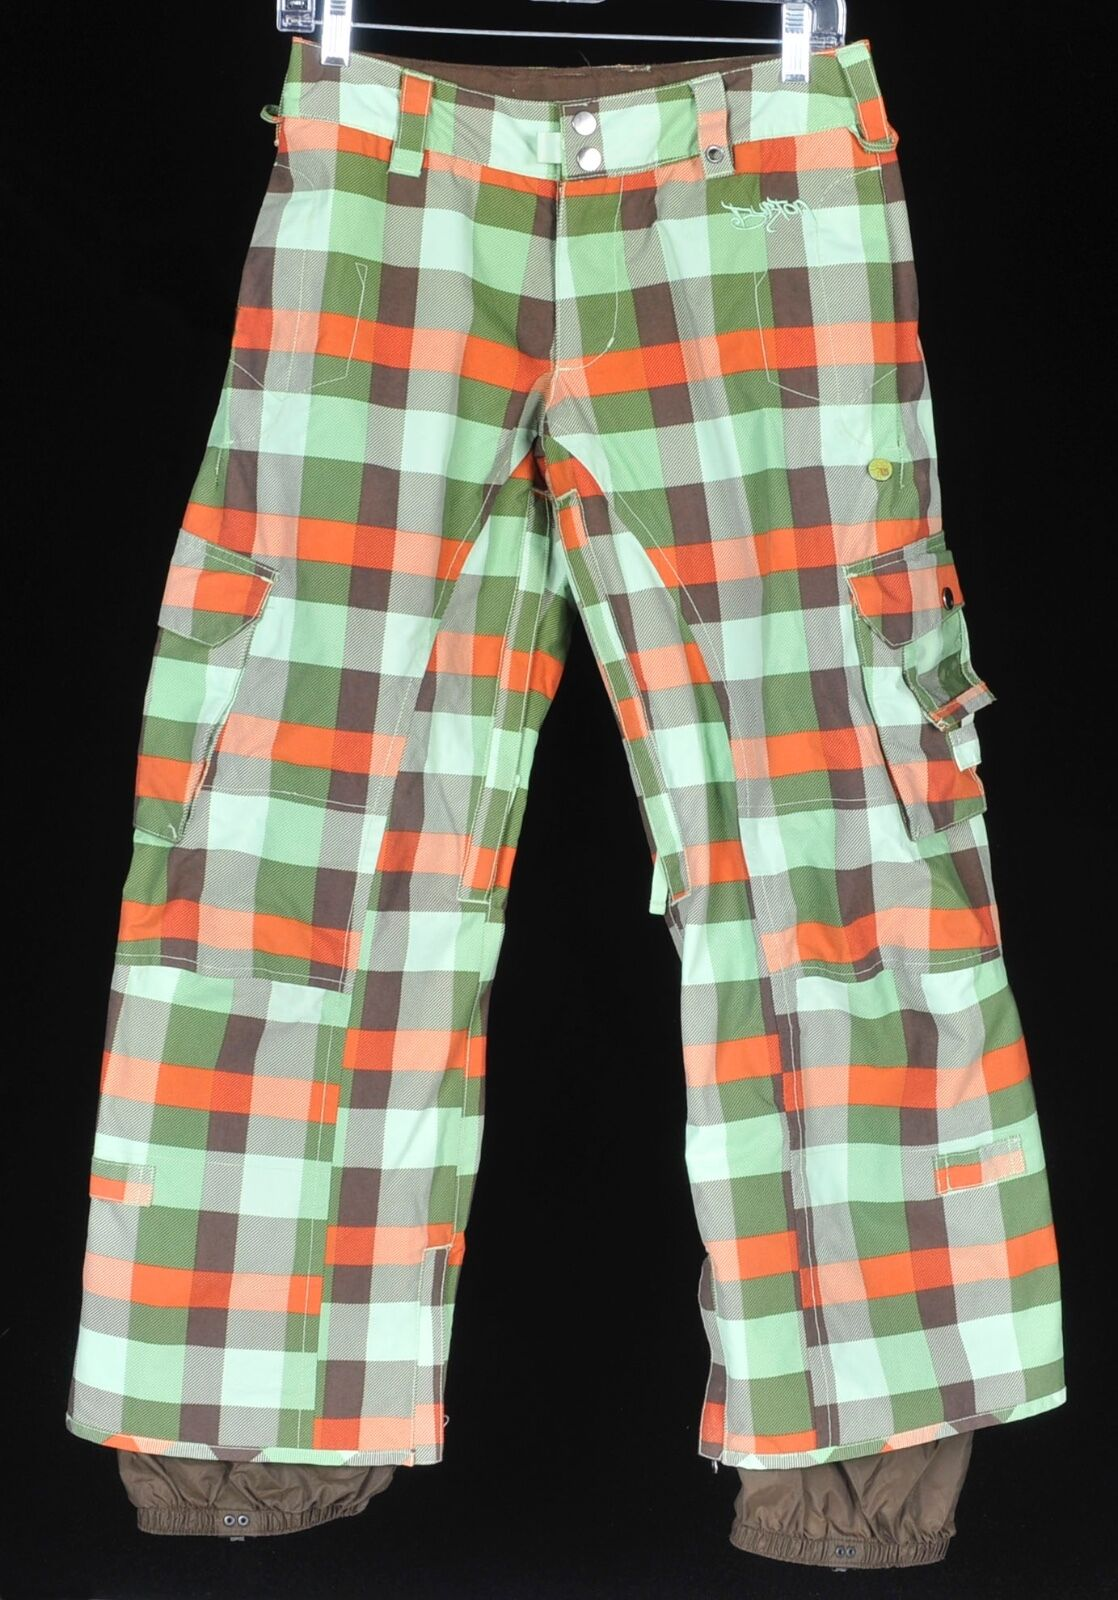 Burton Ski Stow Cargo Ski Burton Snowboard Pants Damenschuhe XS Short Plaid Grün 2ff33c